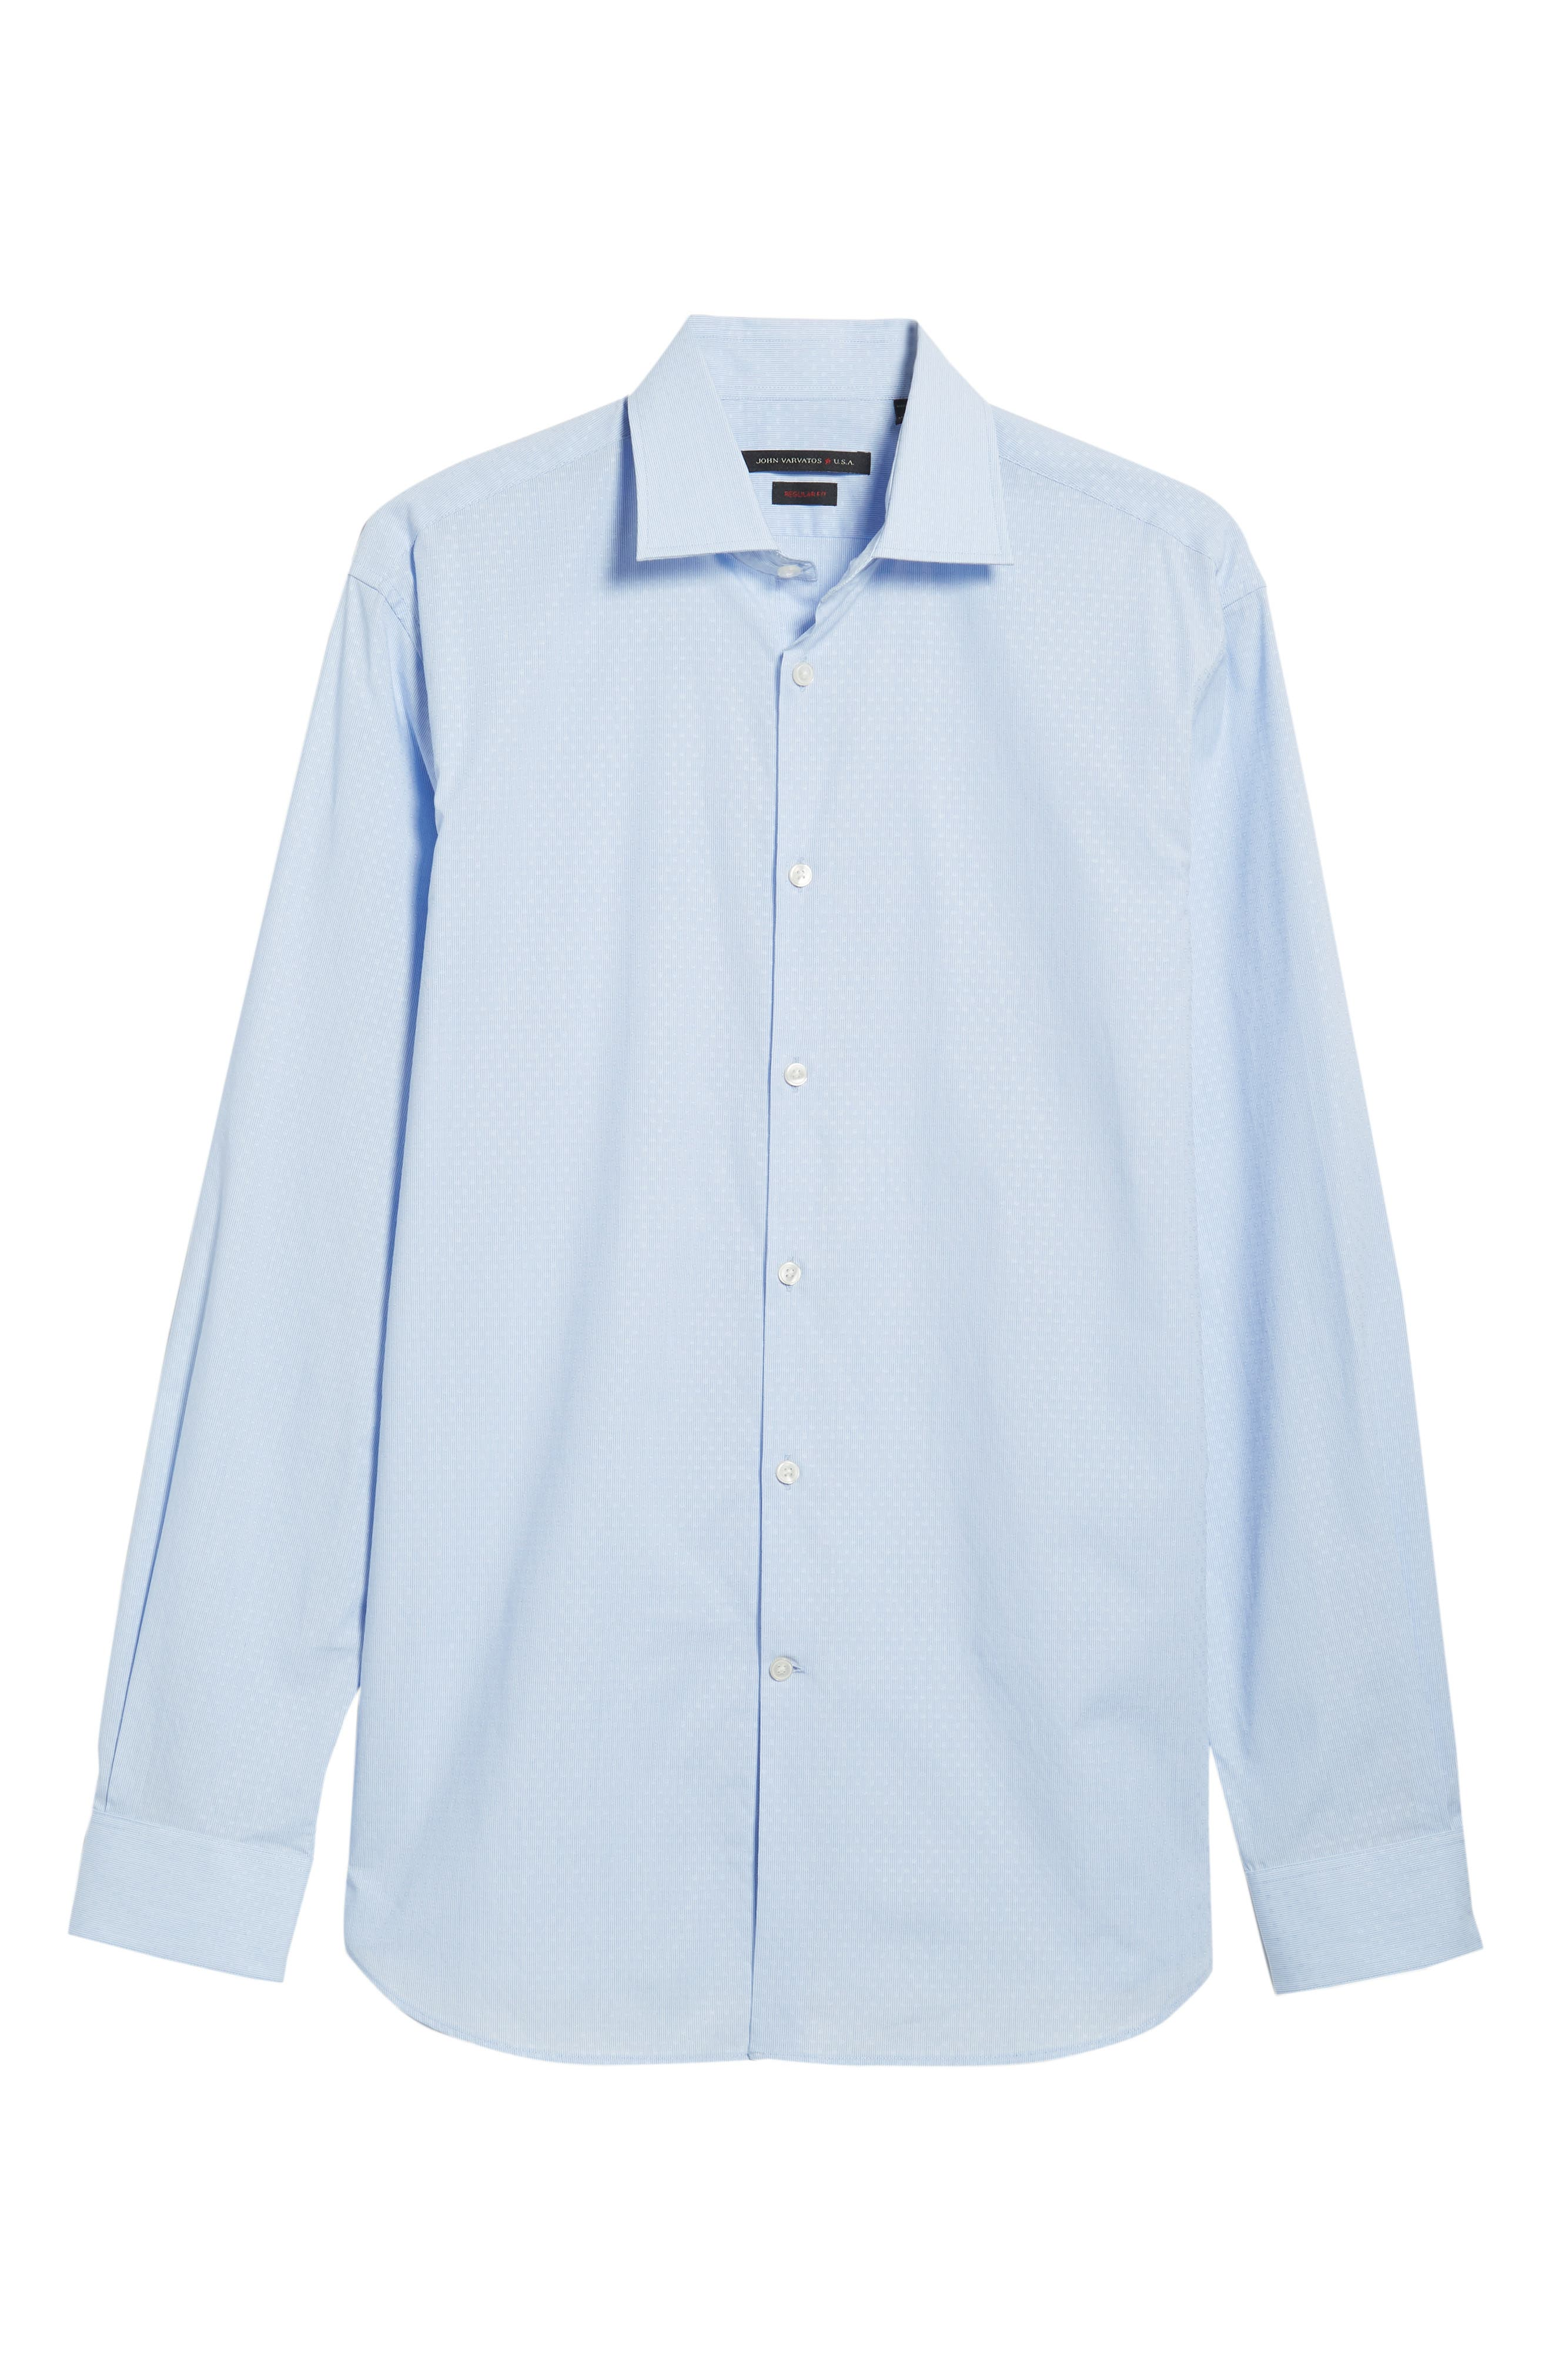 Regular Fit Stripe Dress Shirt,                             Alternate thumbnail 5, color,                             CLOUD